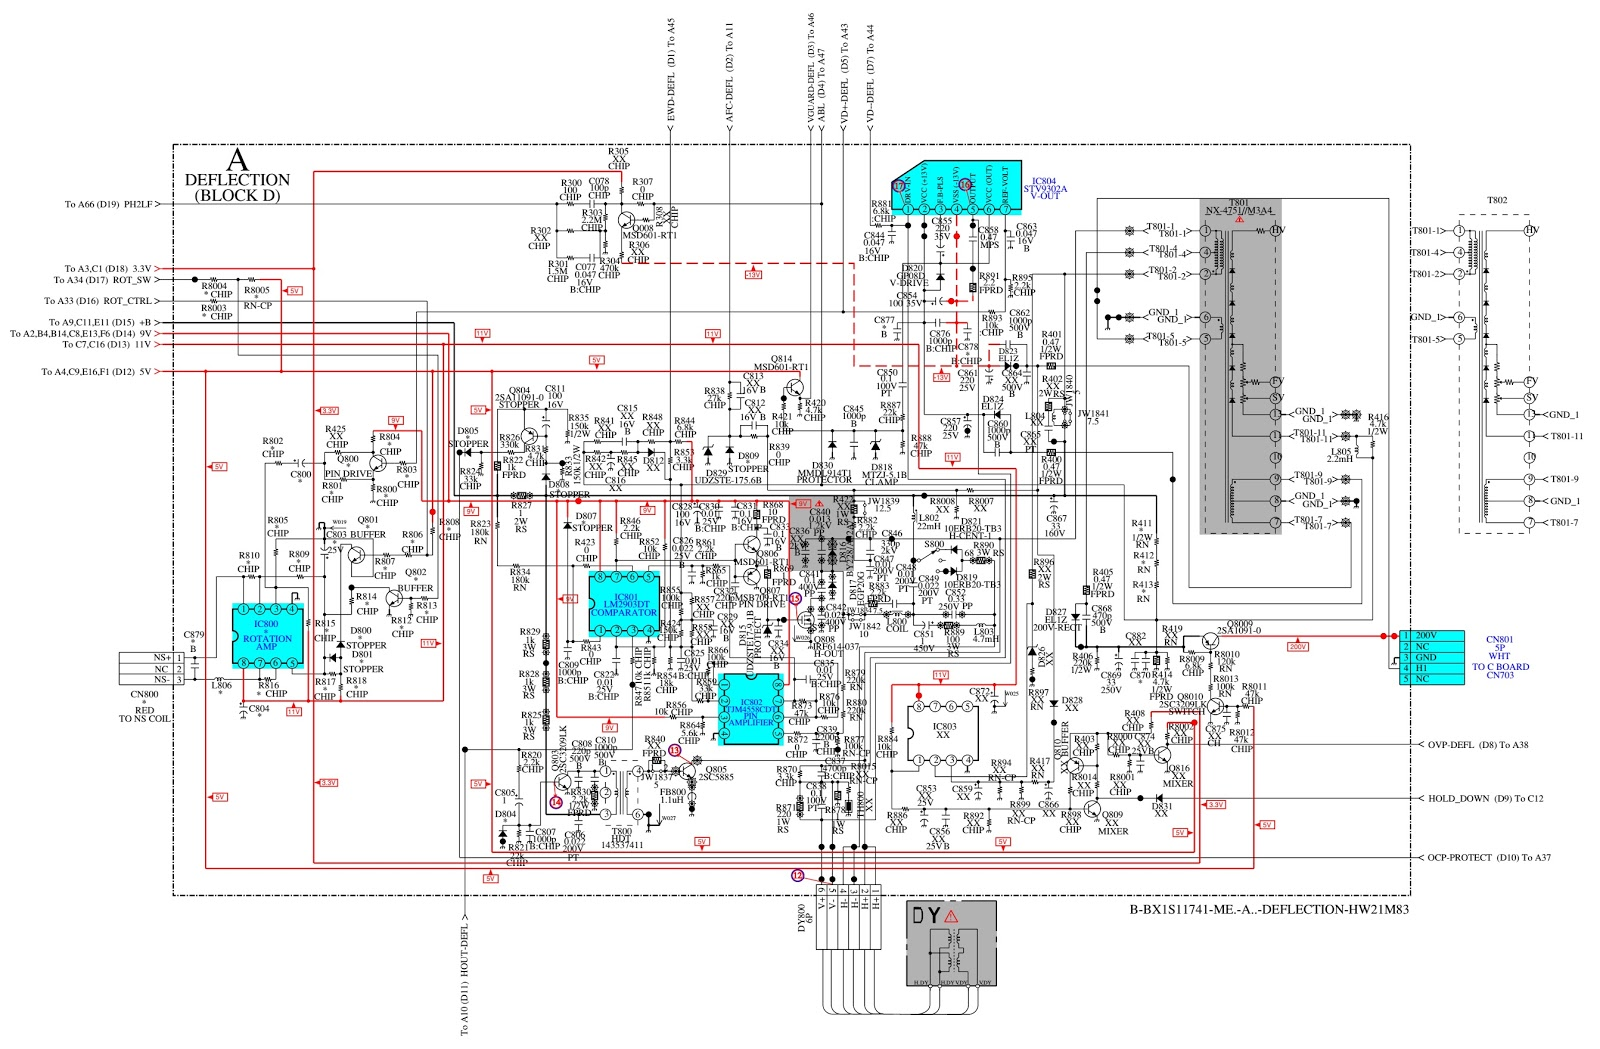 Tv Tuner Card Circuit Diagram Smart Car Alternator Wiring Kv Hw21m50  Sony Trinitron Crt